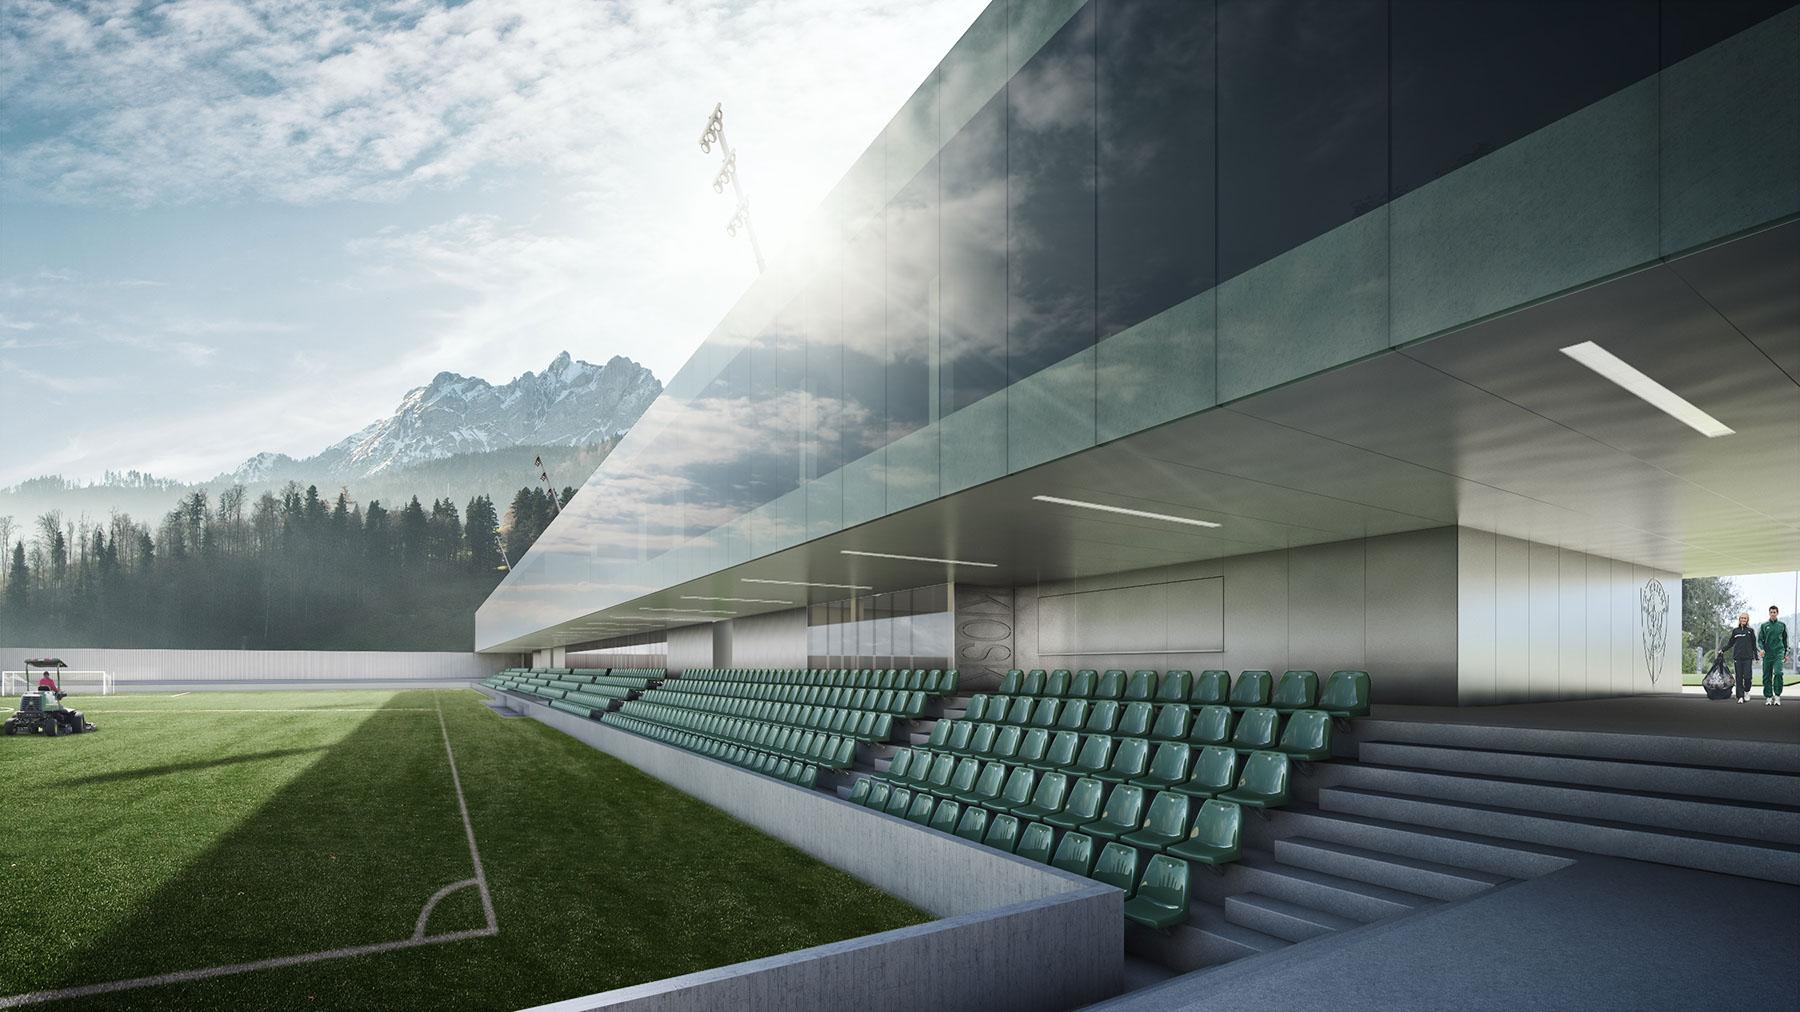 Sportzentrum Kleinfeld